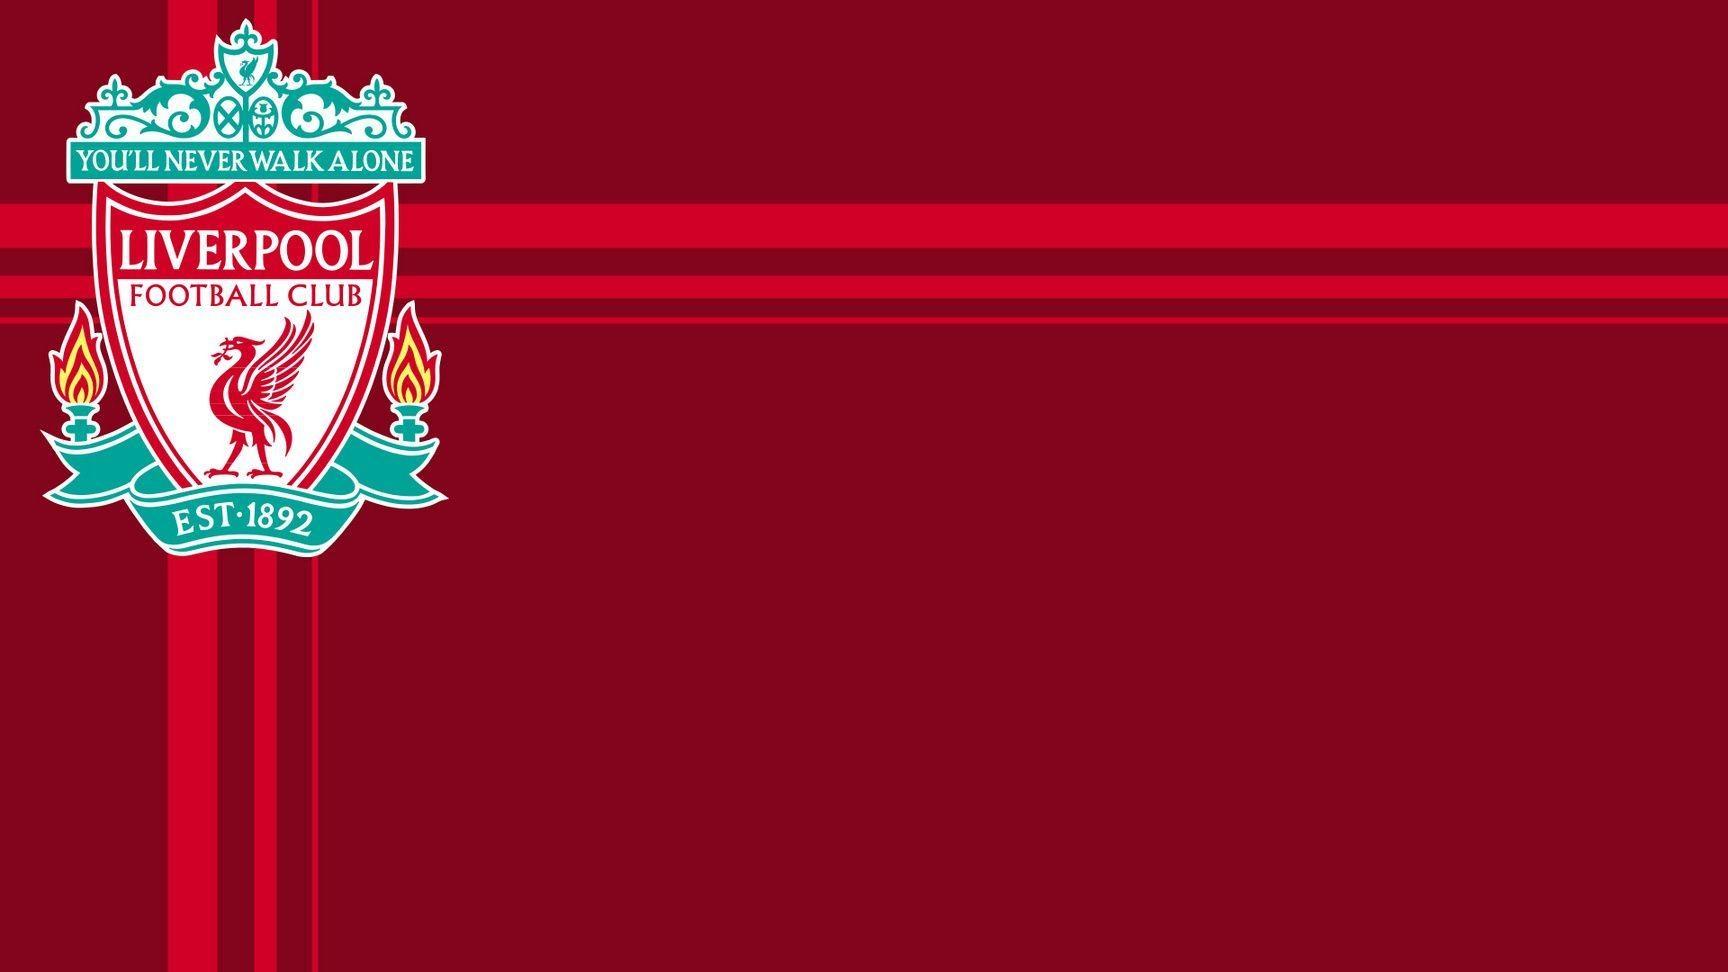 Liverpool 34 Liverpool Logo Wallpaper Hd Pc 1728x972 Download Hd Wallpaper Wallpapertip